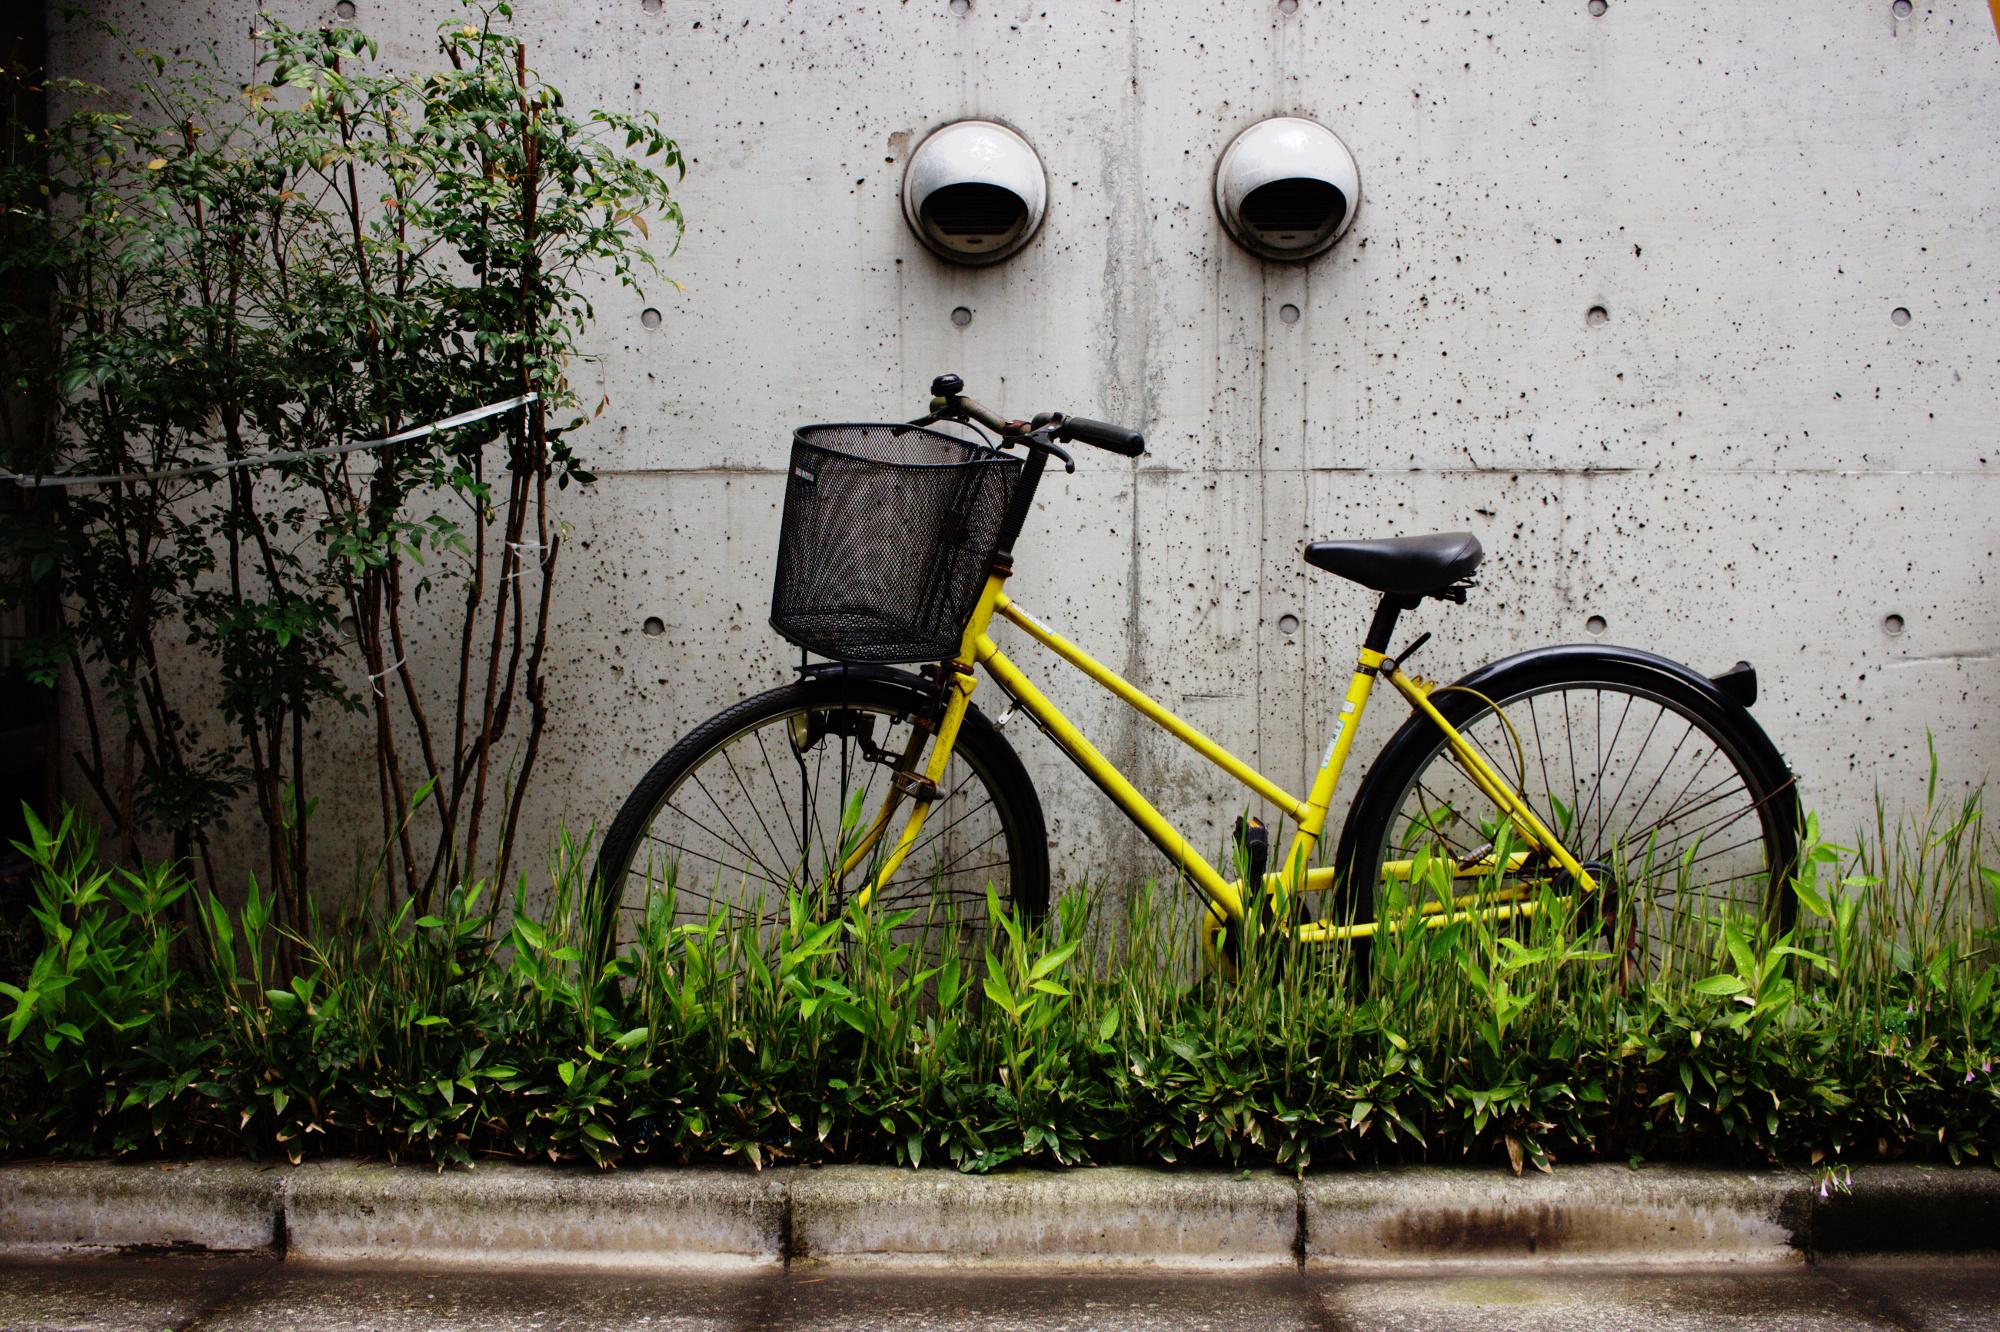 Bicycle in Ikebukuro, Tokyo, June 2016.